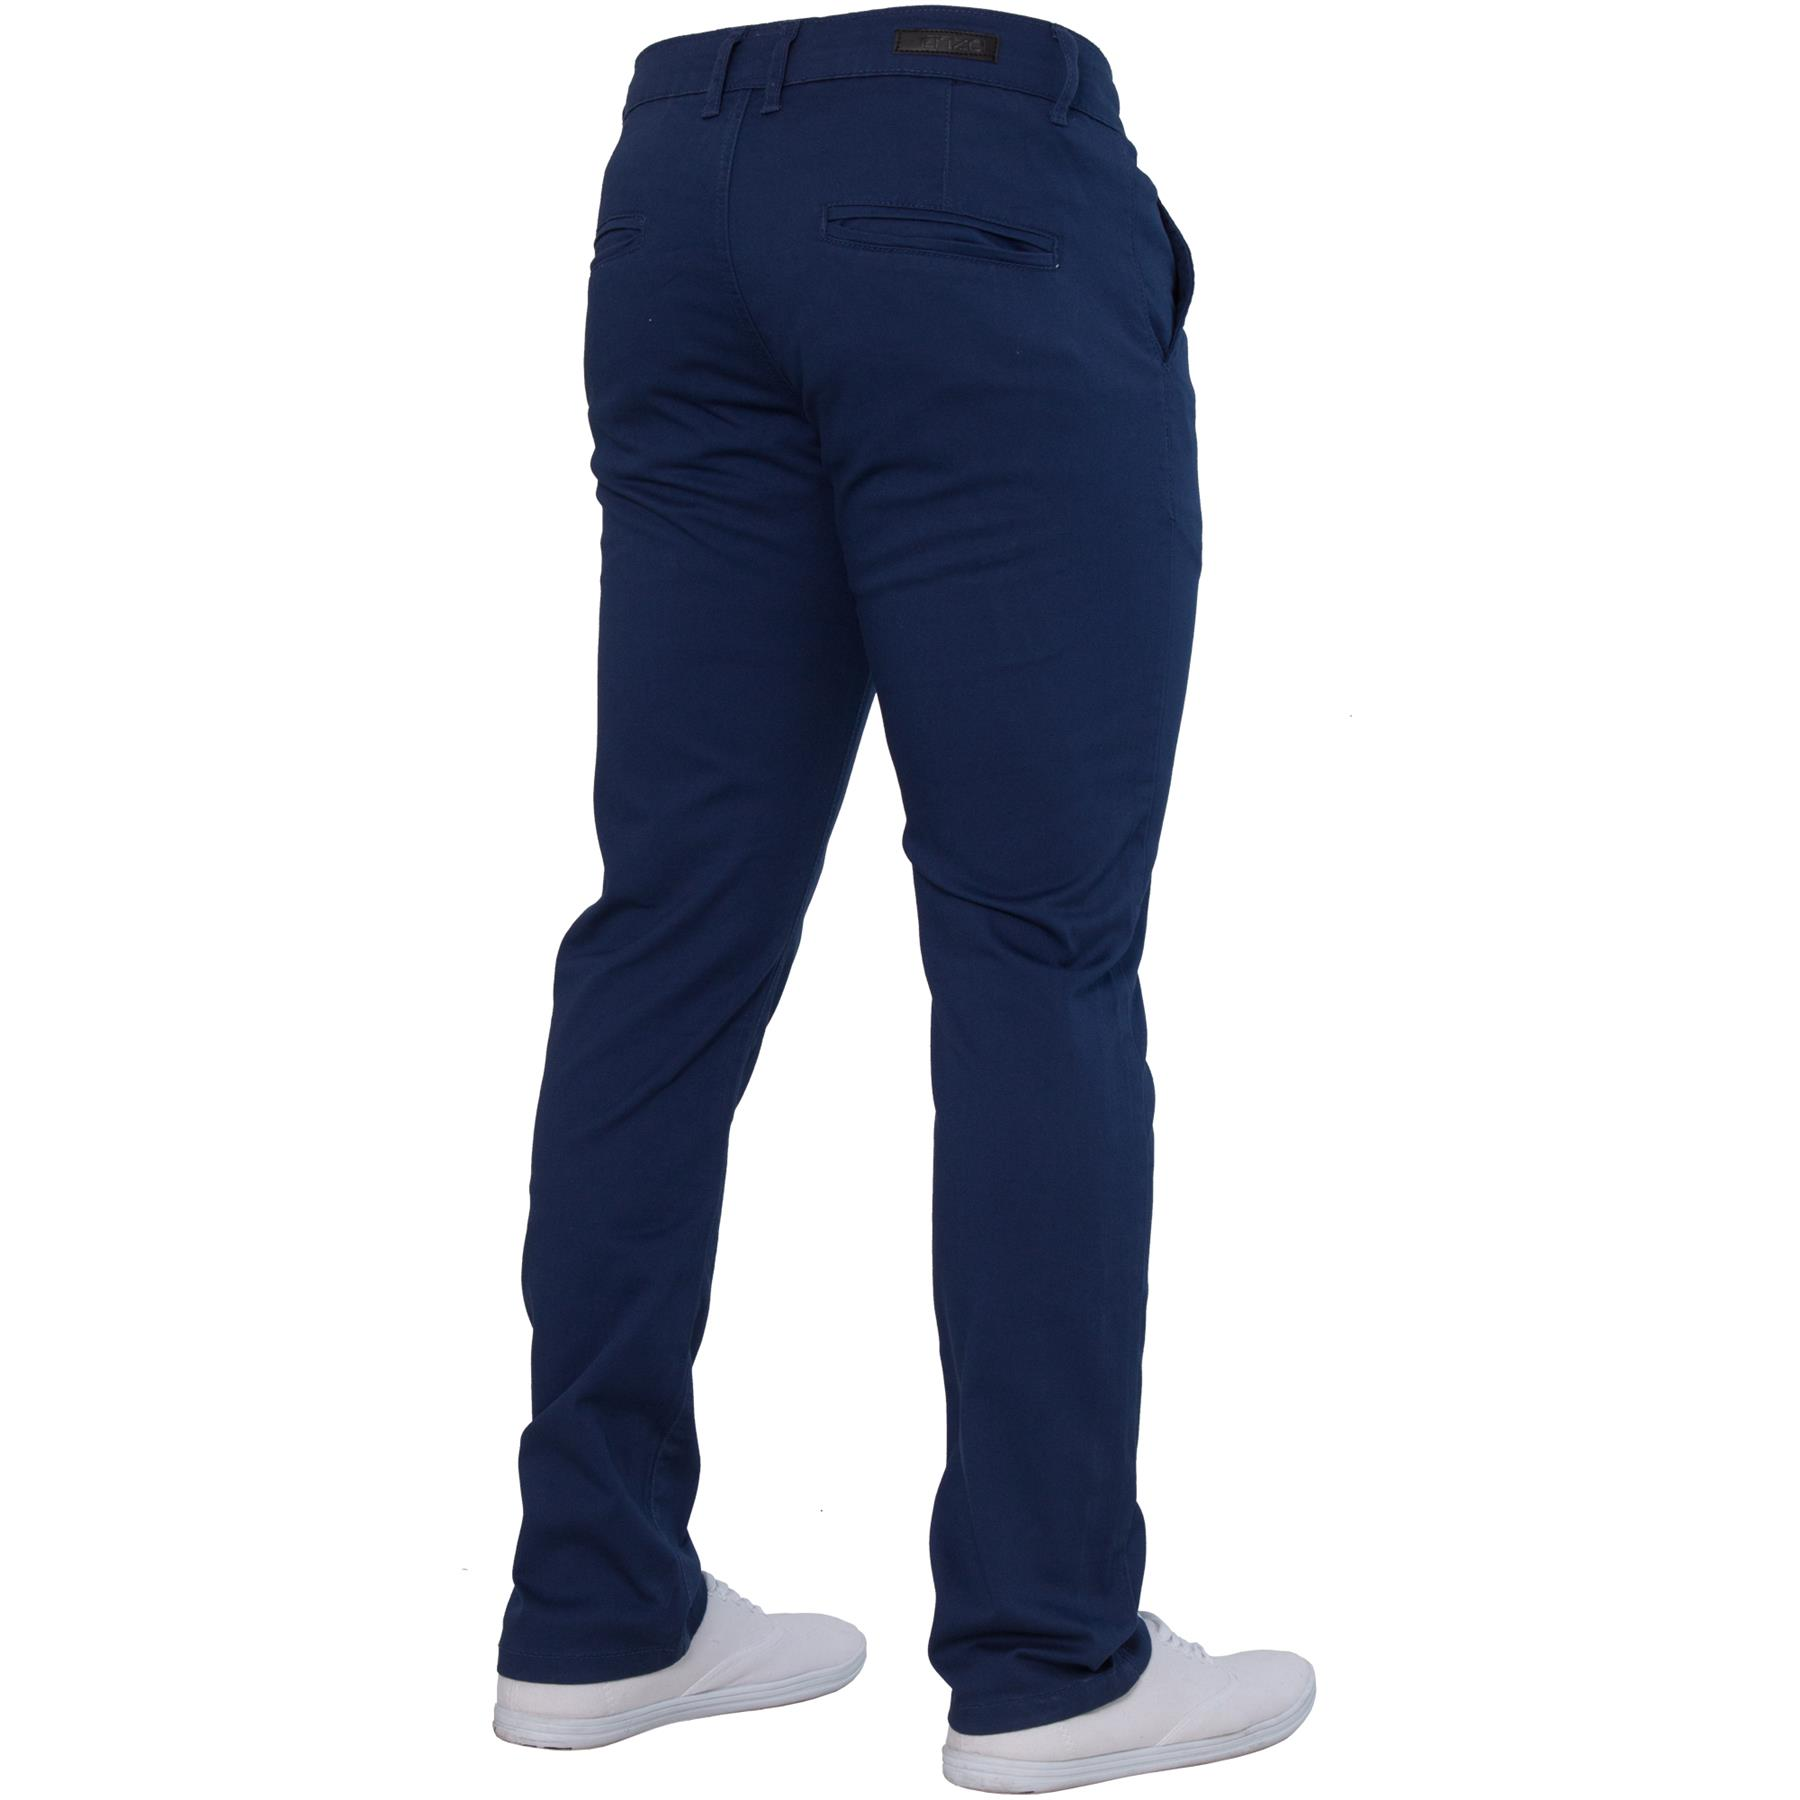 ENZO-Jeans-para-hombre-Big-Alto-Pierna-King-Size-Jeans-Pantalones-Chino-Pantalones-Pantalones-44-034 miniatura 9